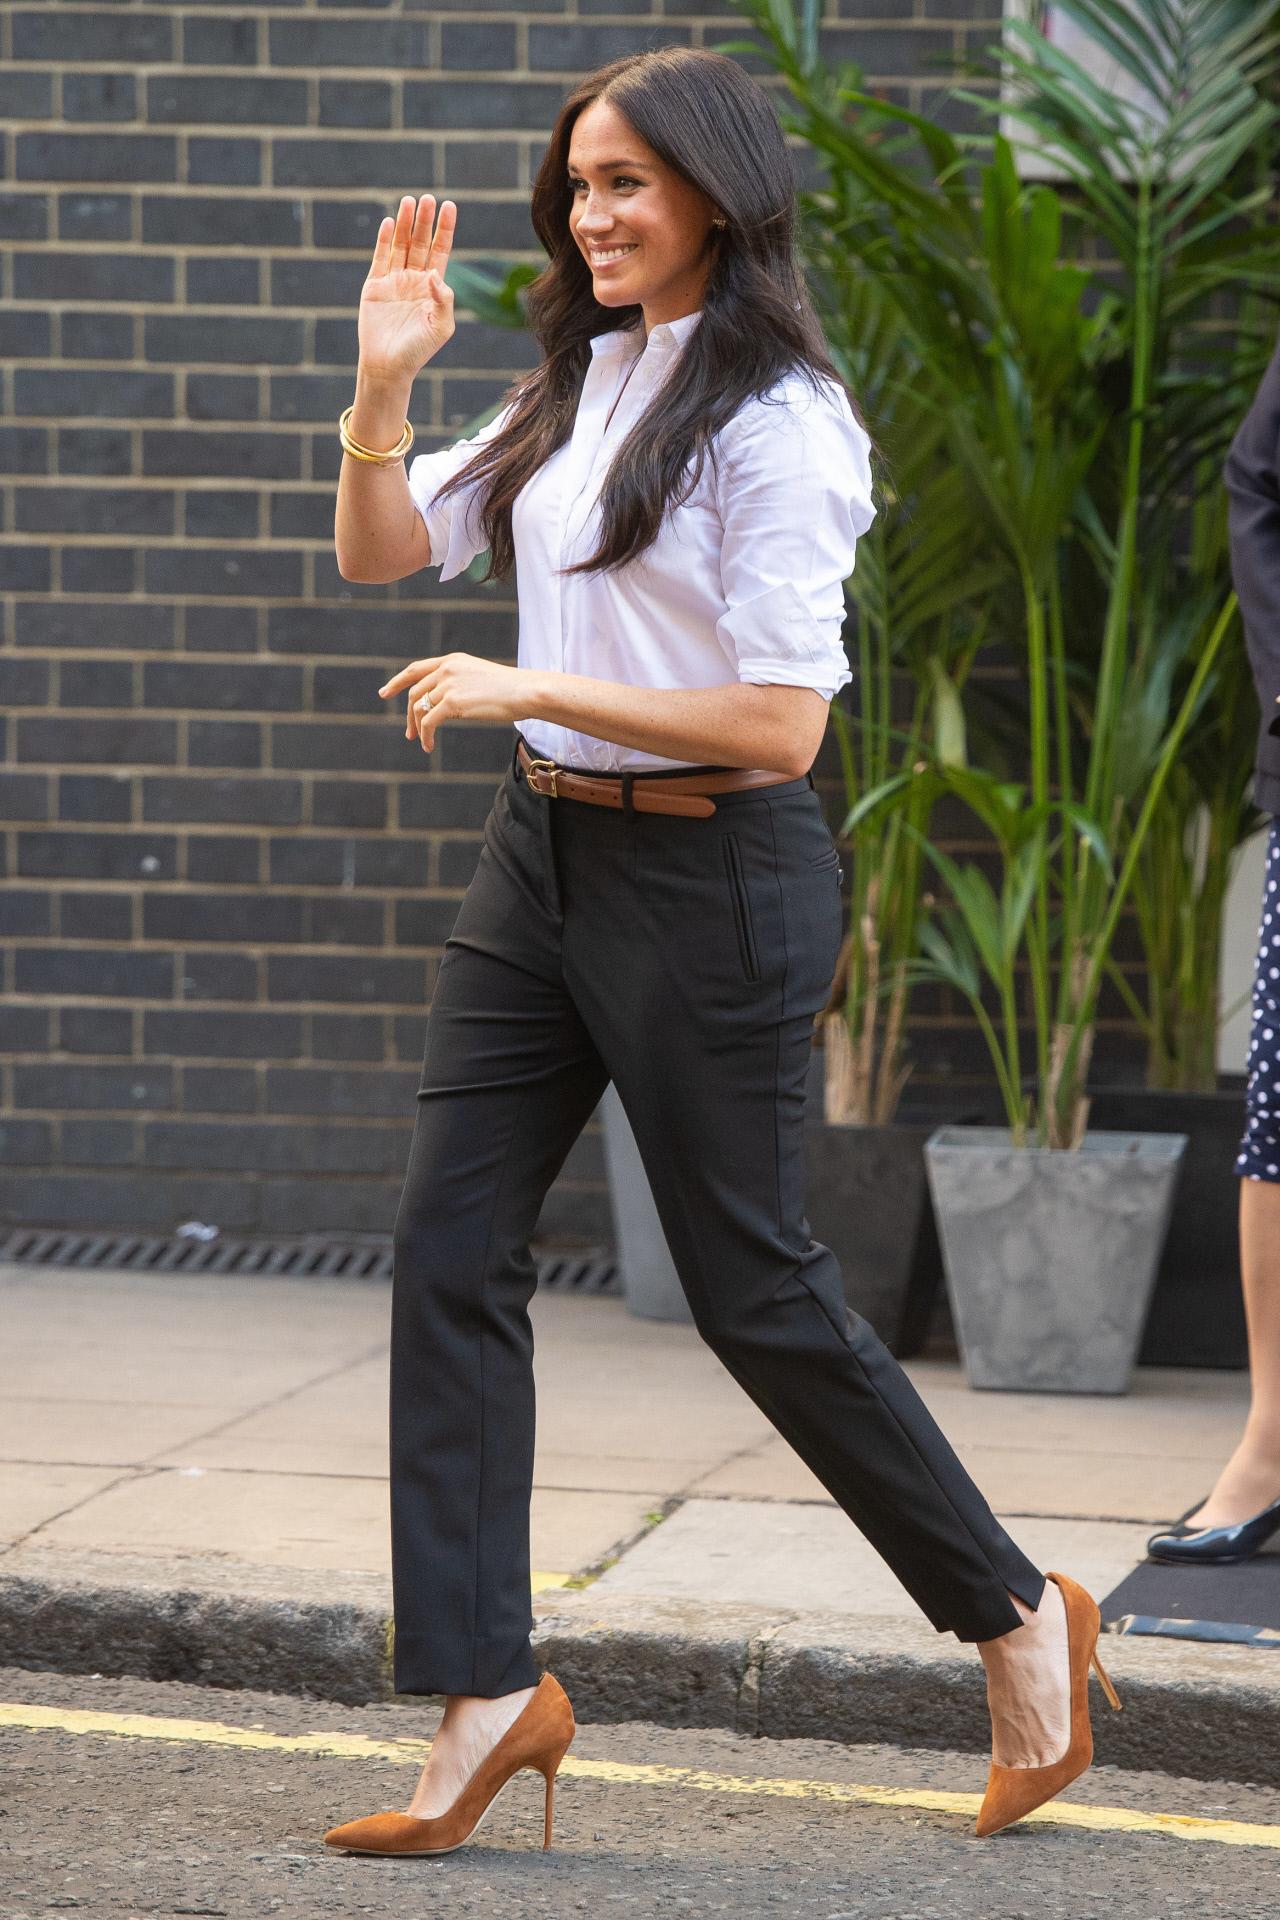 La duquesa de Sussex combina la camisa clásica con pantalones negros.